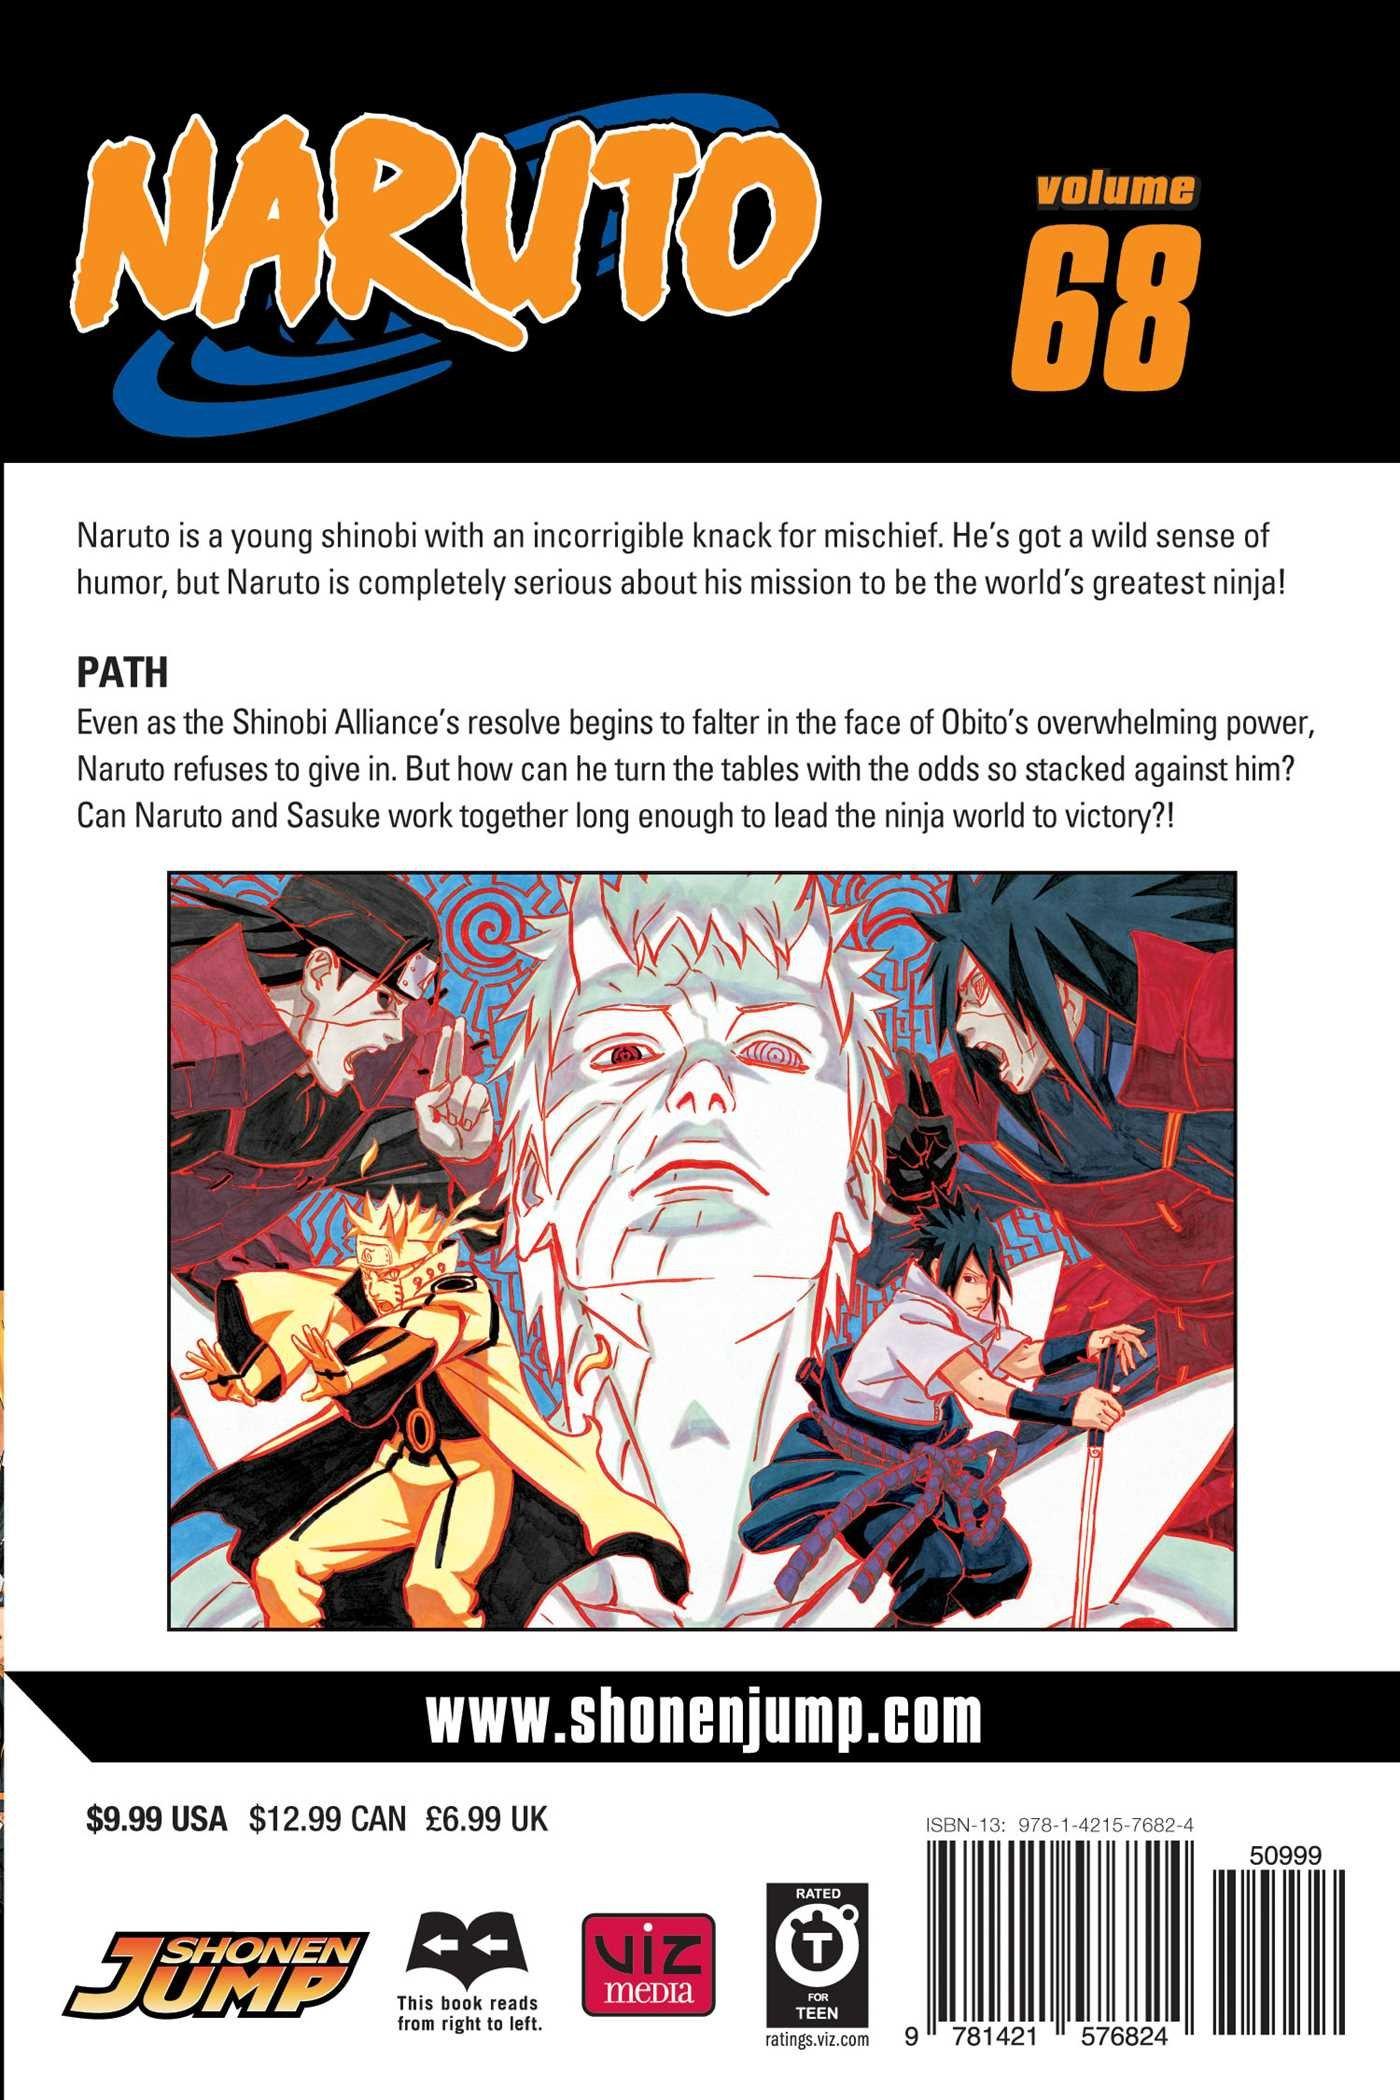 Naruto 68: Amazon.es: Masashi Kishimoto: Libros en idiomas ...